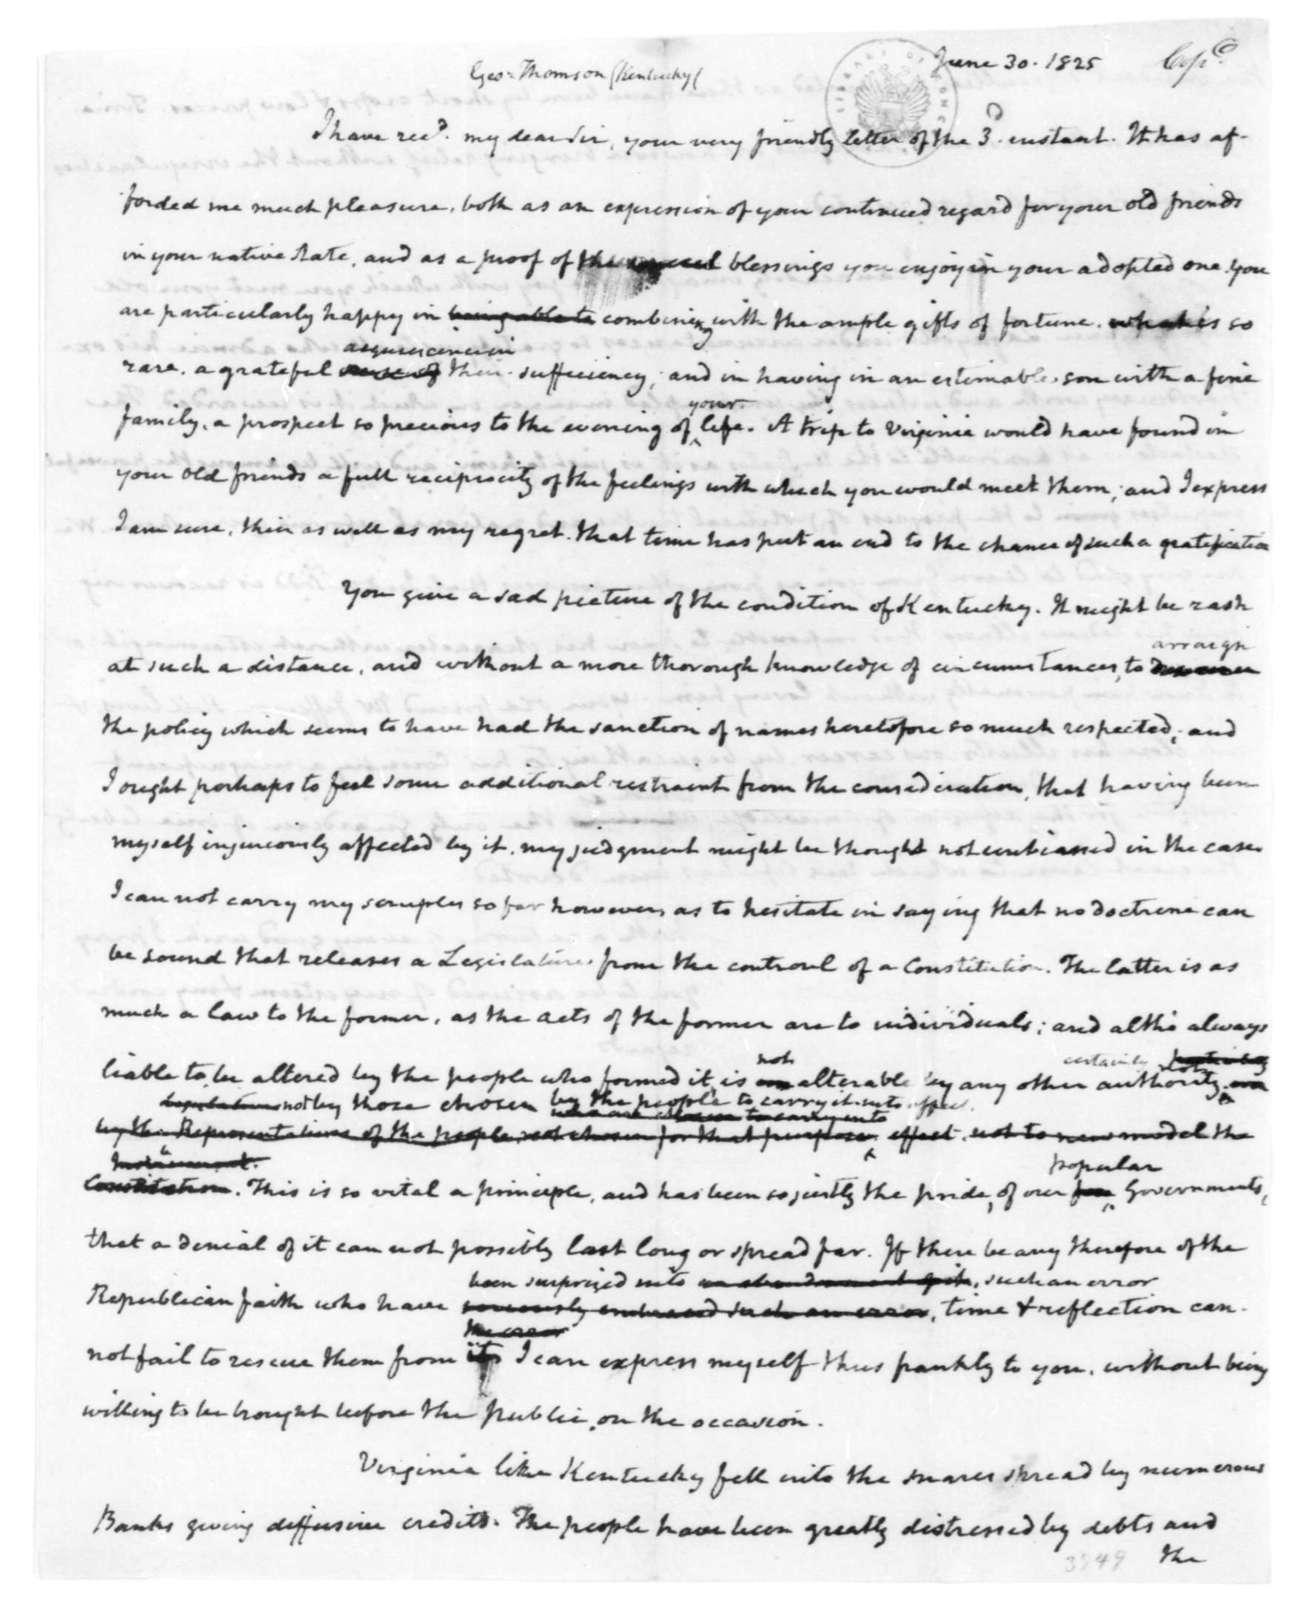 James Madison to George Thomson, June 30, 1825.